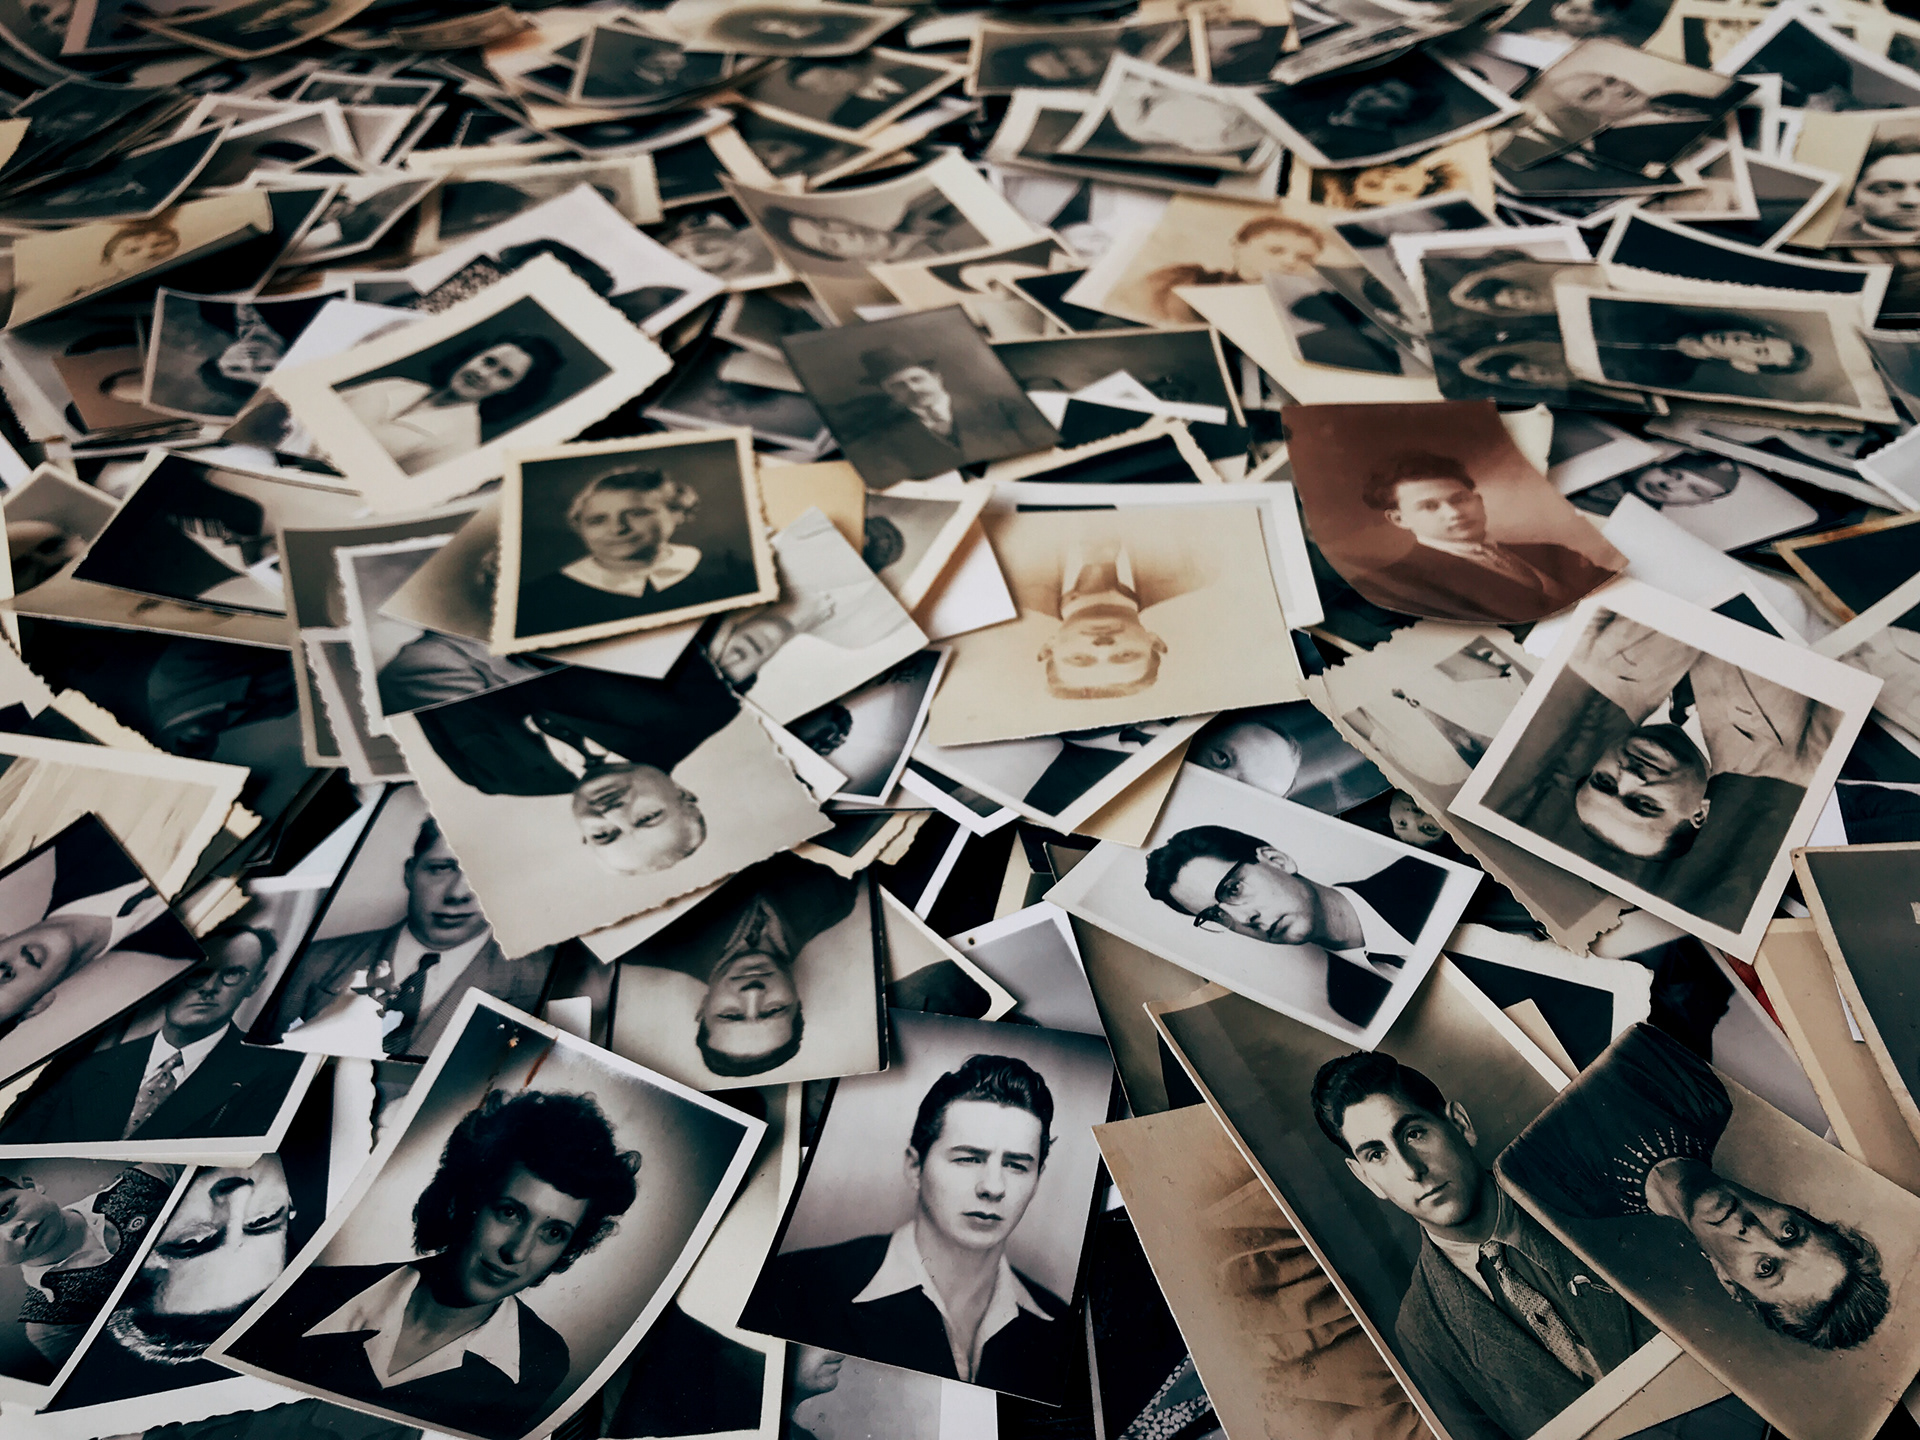 Mementoes at a vide-grenier (attic sale)